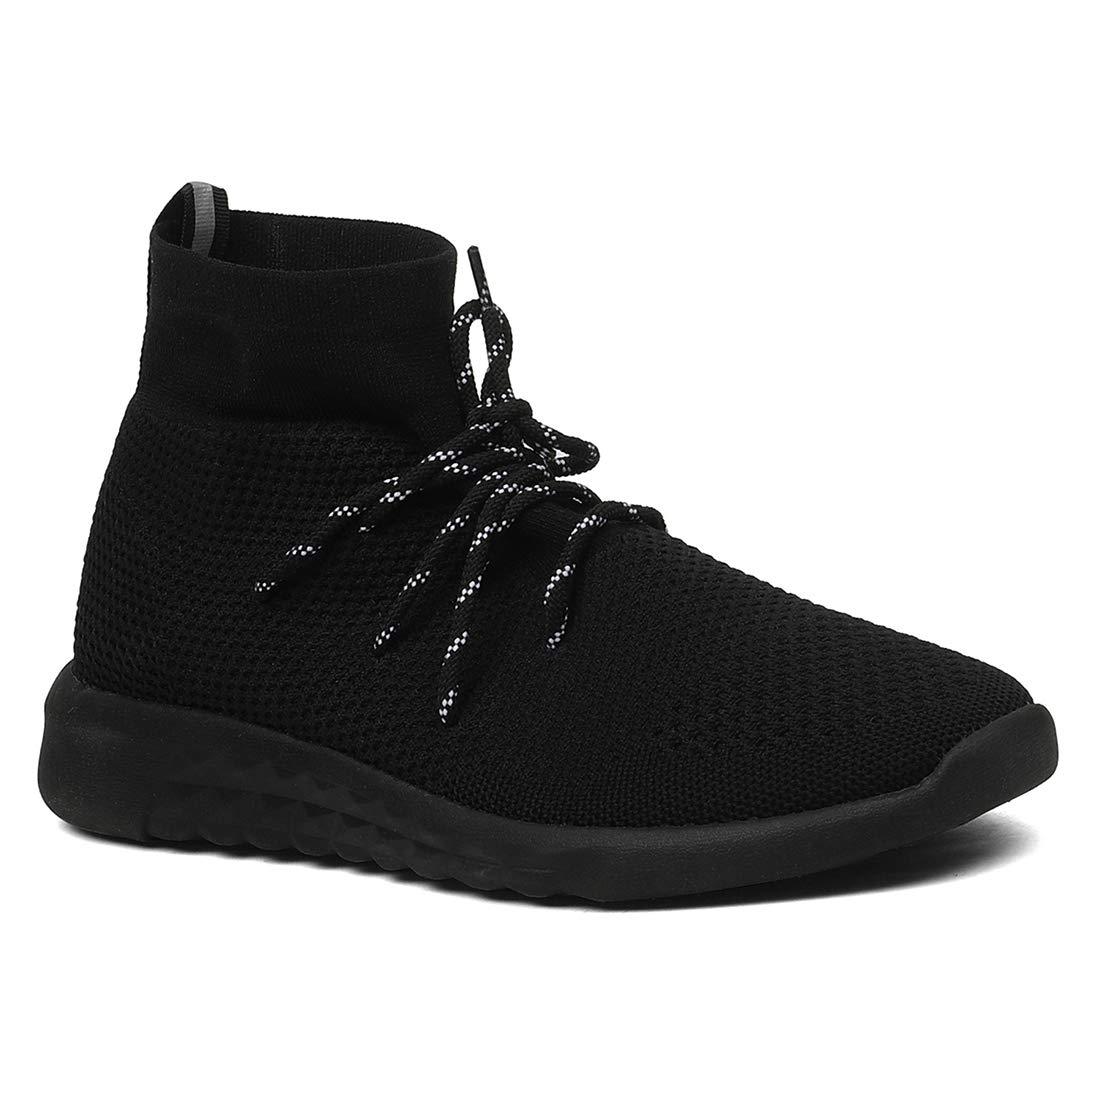 sneakers aldo 2018